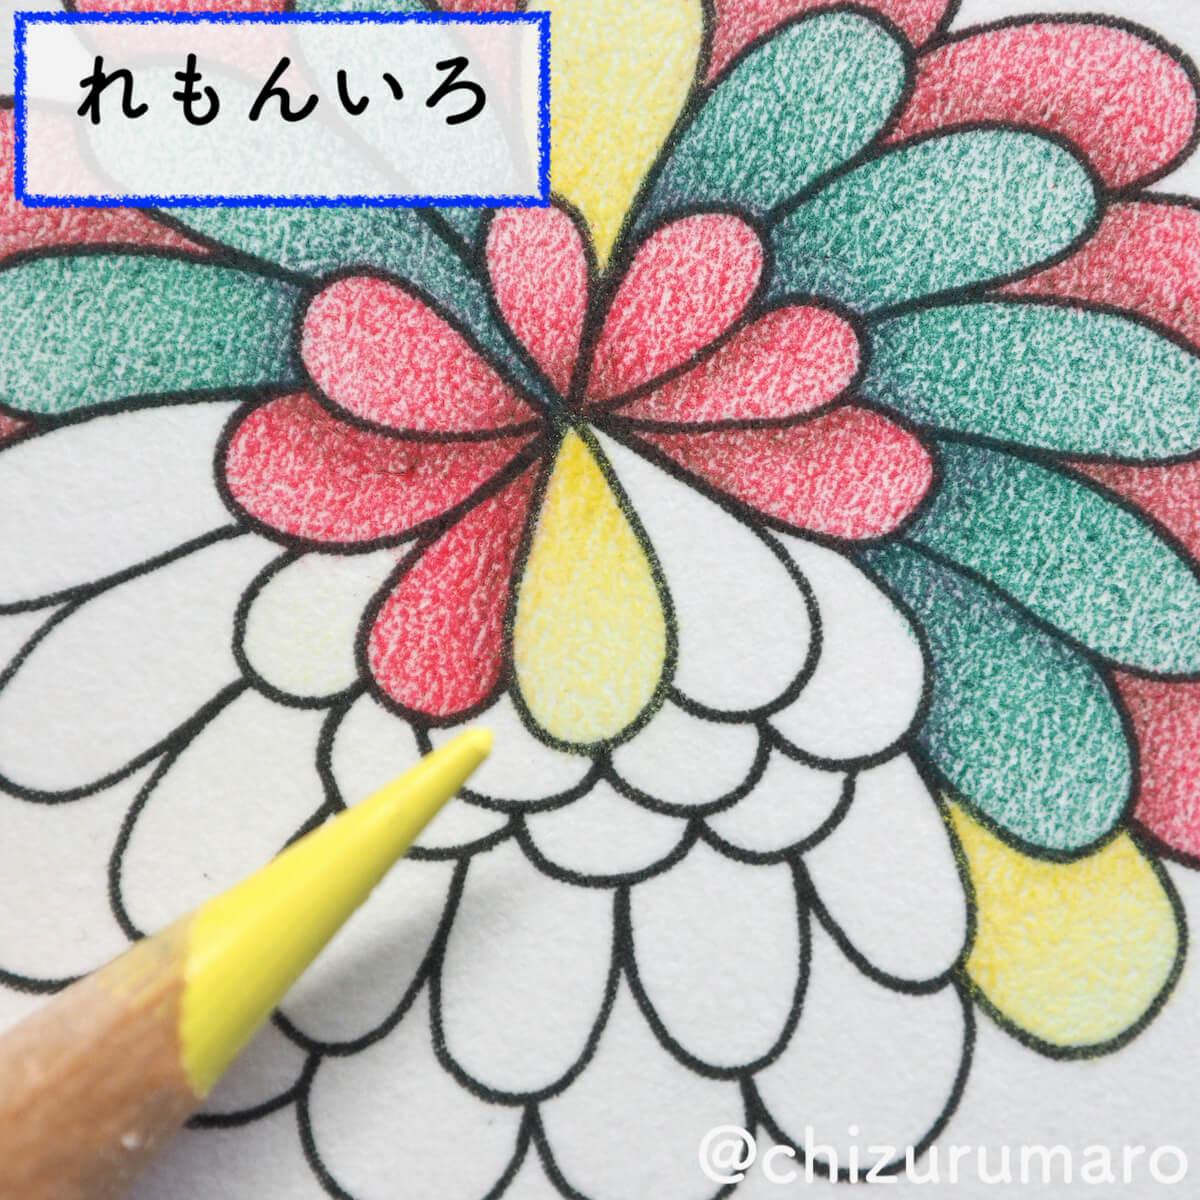 f:id:chizurumaro:20200511125111j:plain